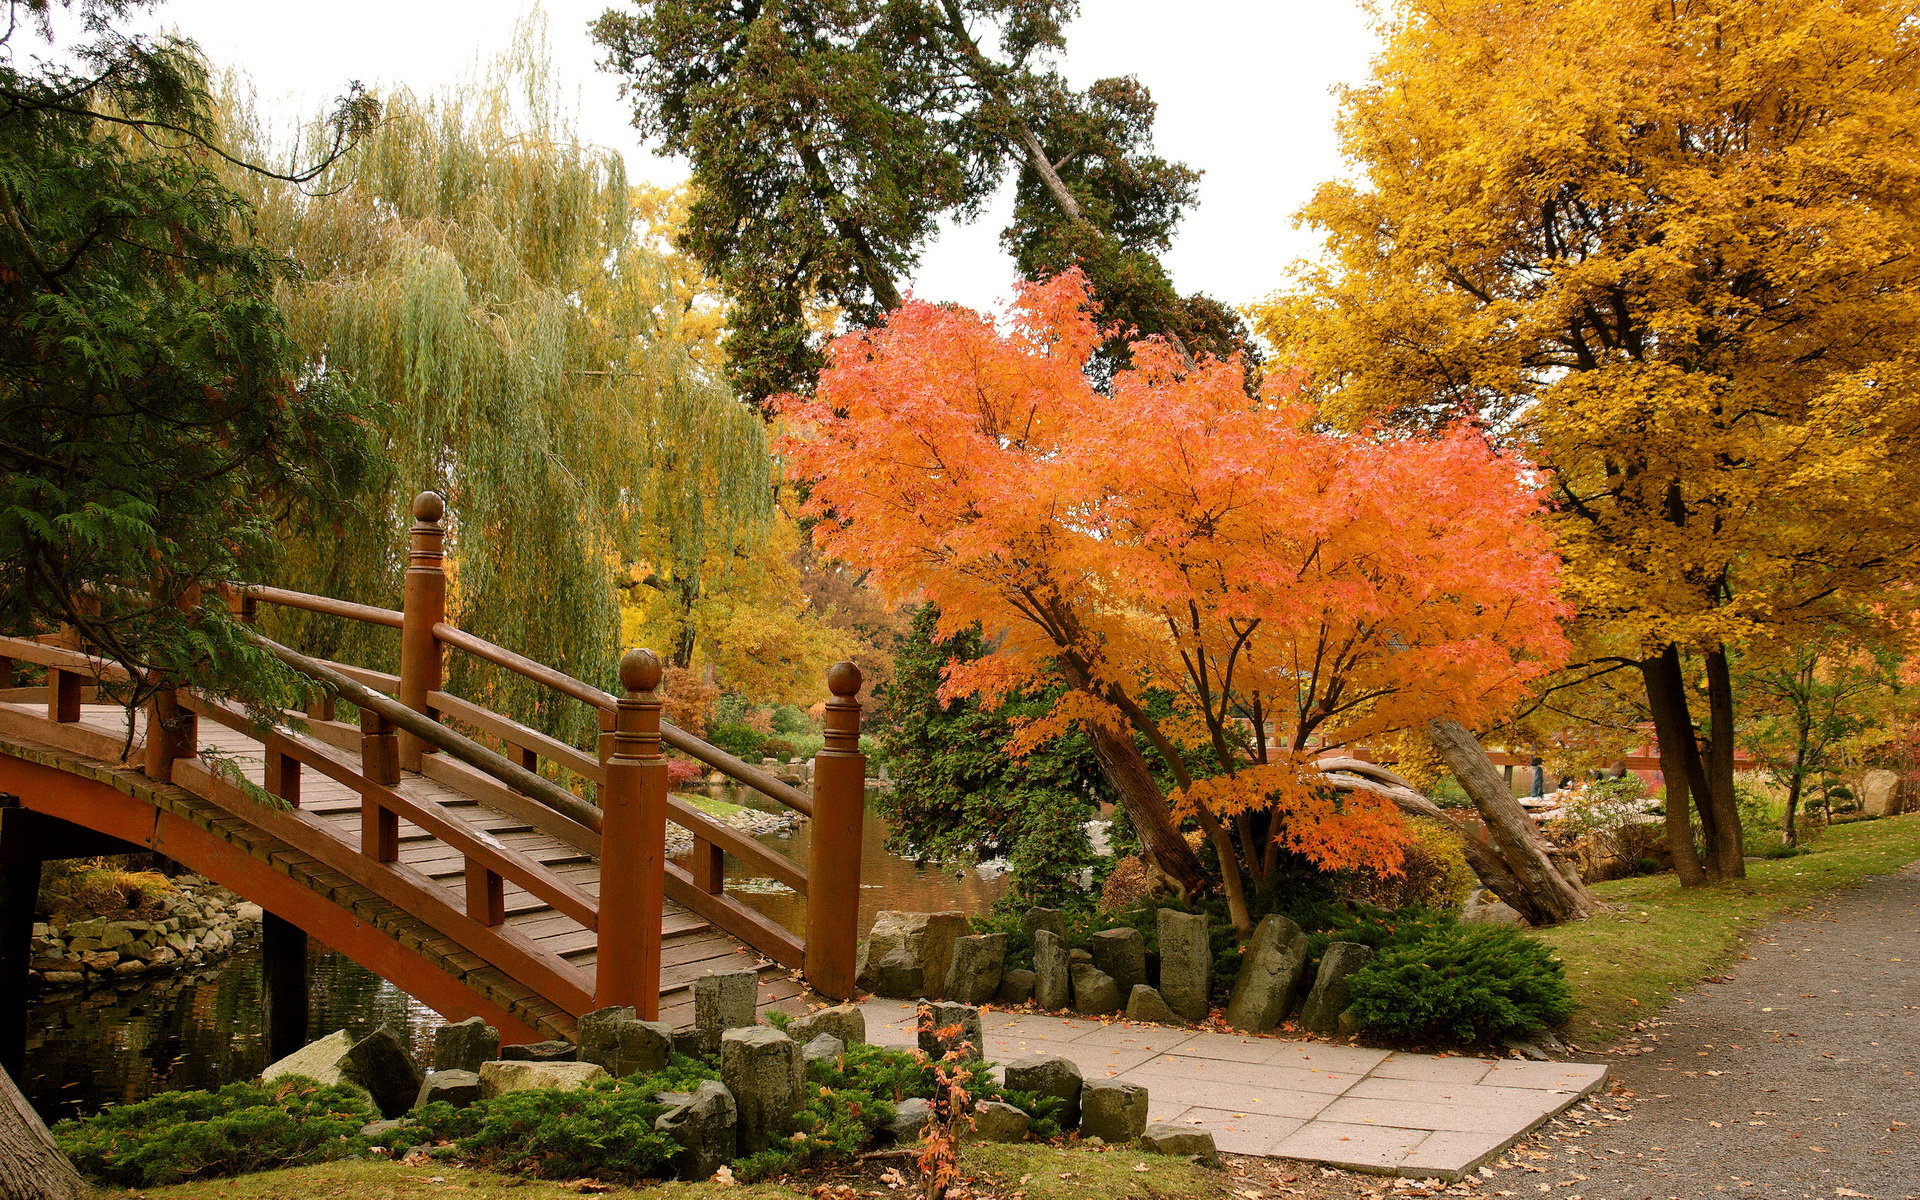 Fall Themed Computer Wallpaper Japanese Garden In Wroclaw By Fikusjanina Desktop Wallpaper